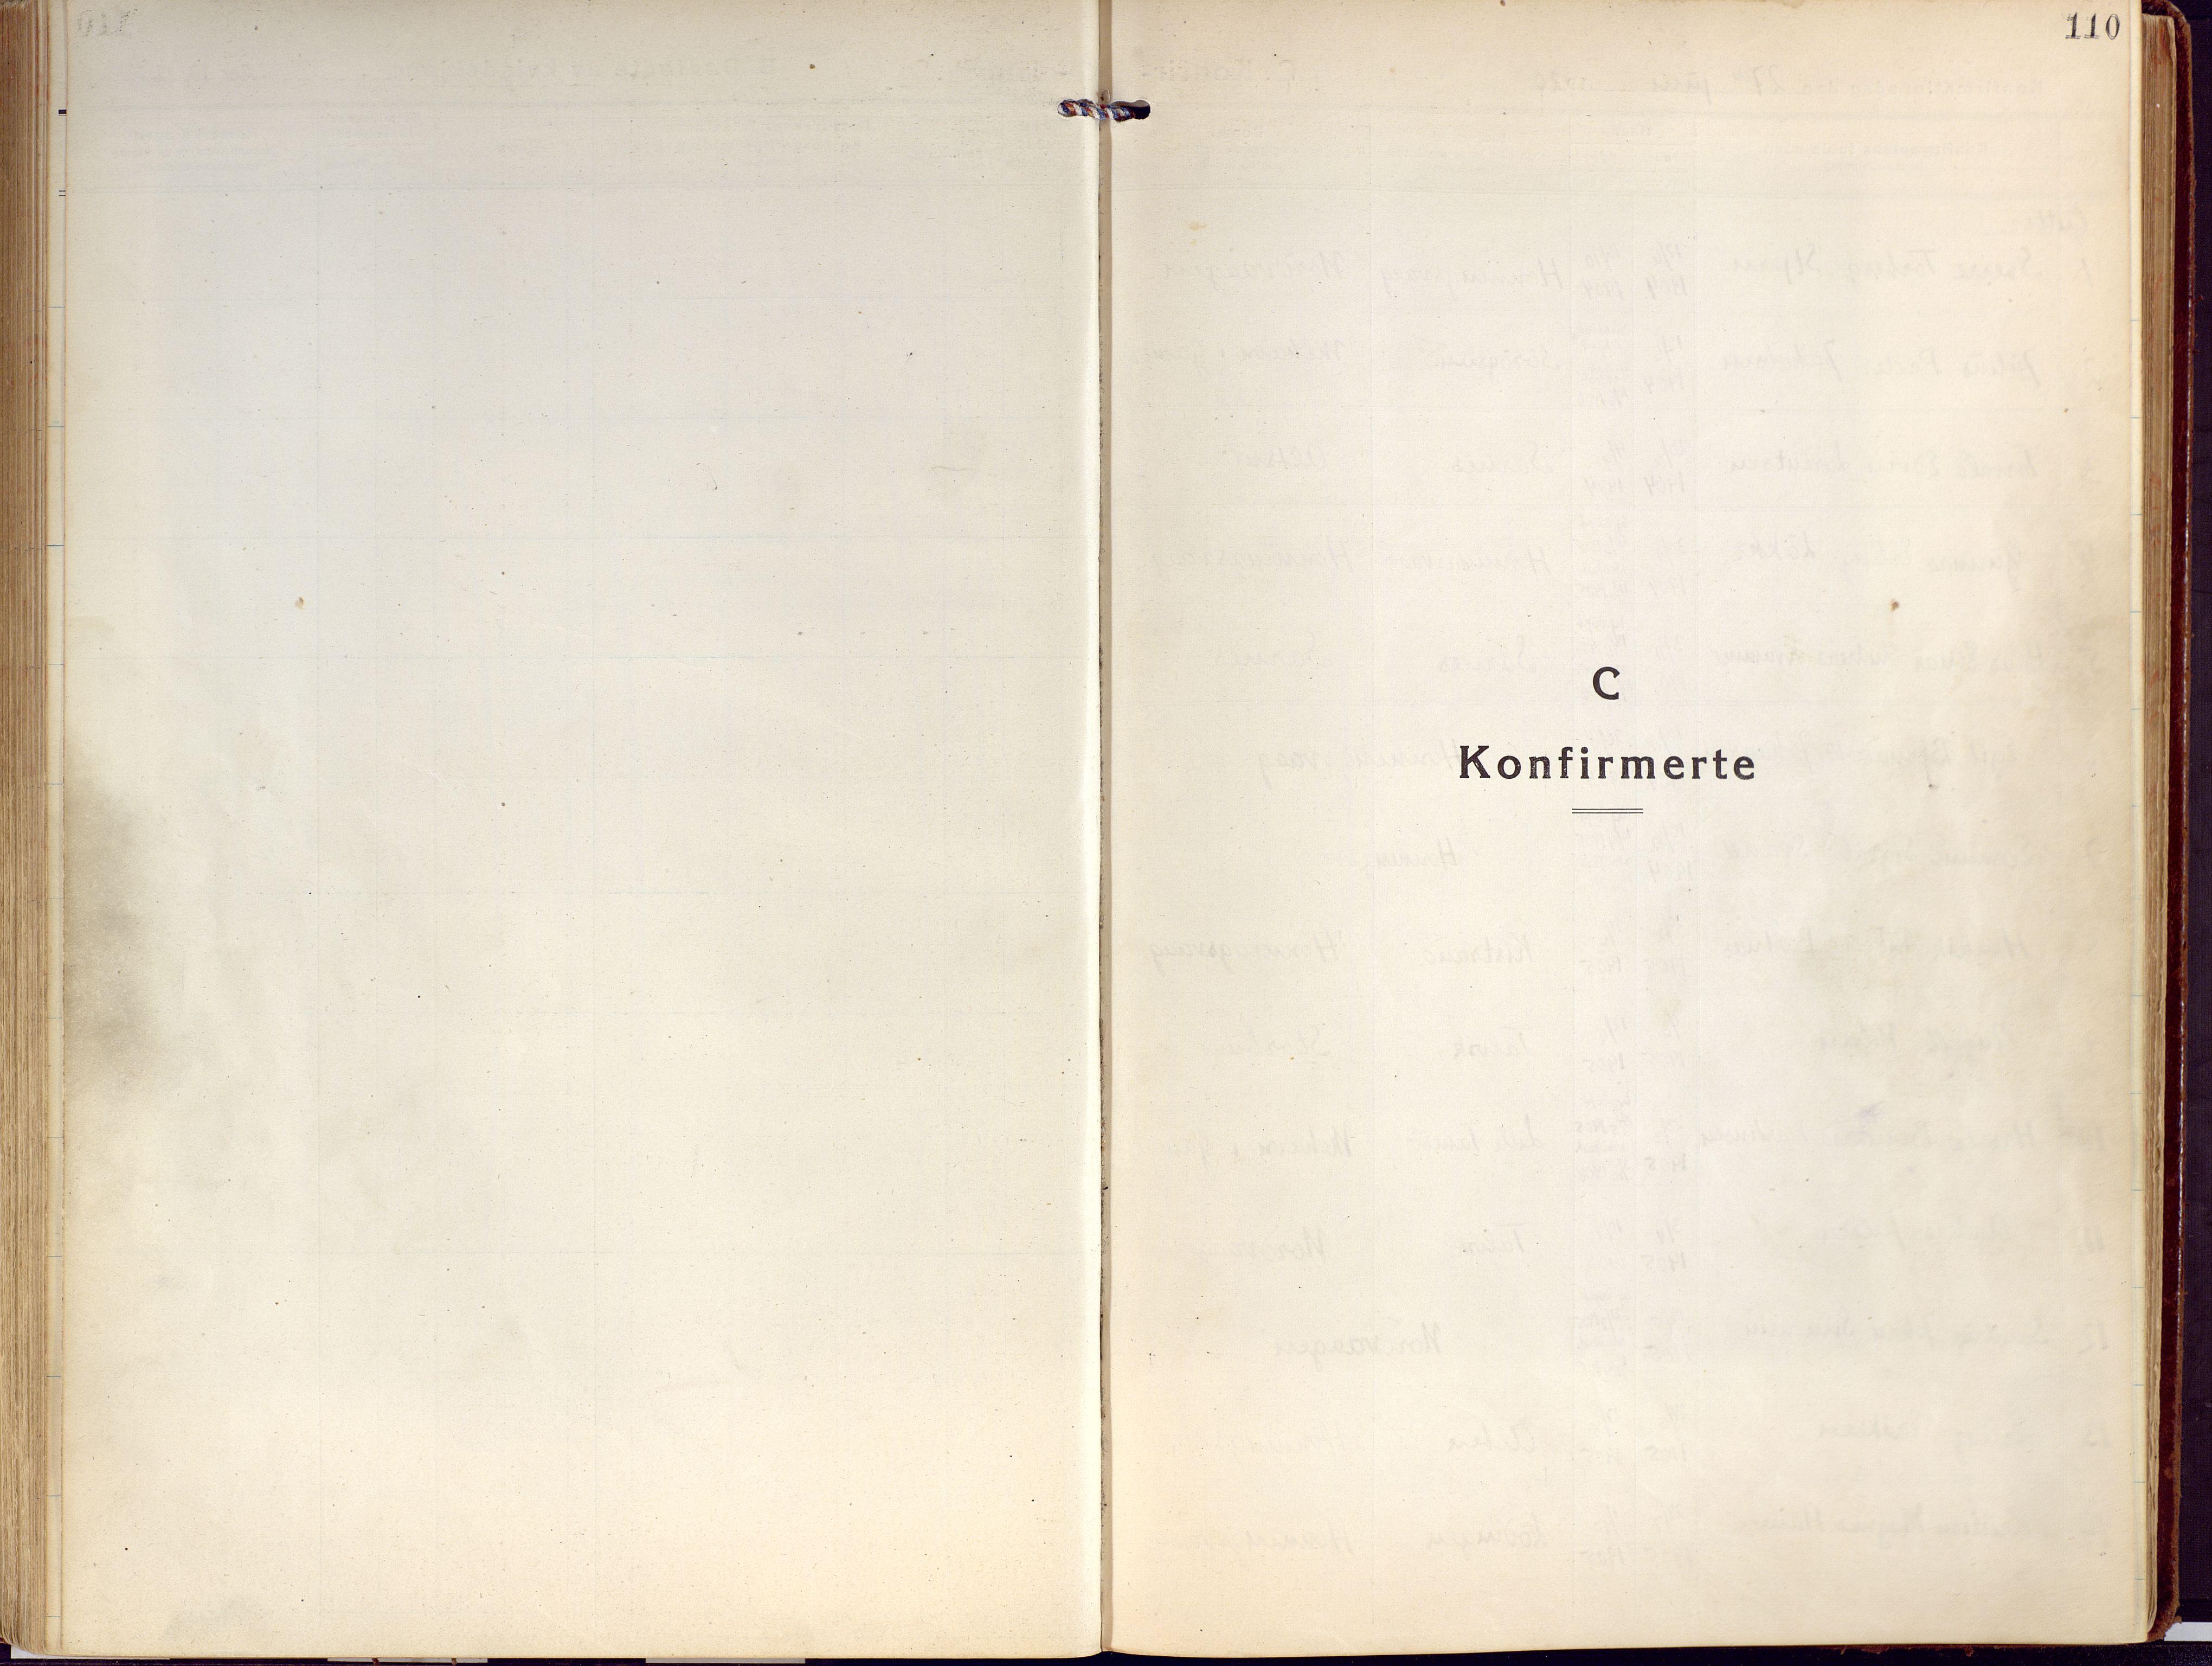 SATØ, Kjelvik/Nordkapp sokneprestkontor, H/Ha/L0002kirke: Ministerialbok nr. 2, 1920-1929, s. 110